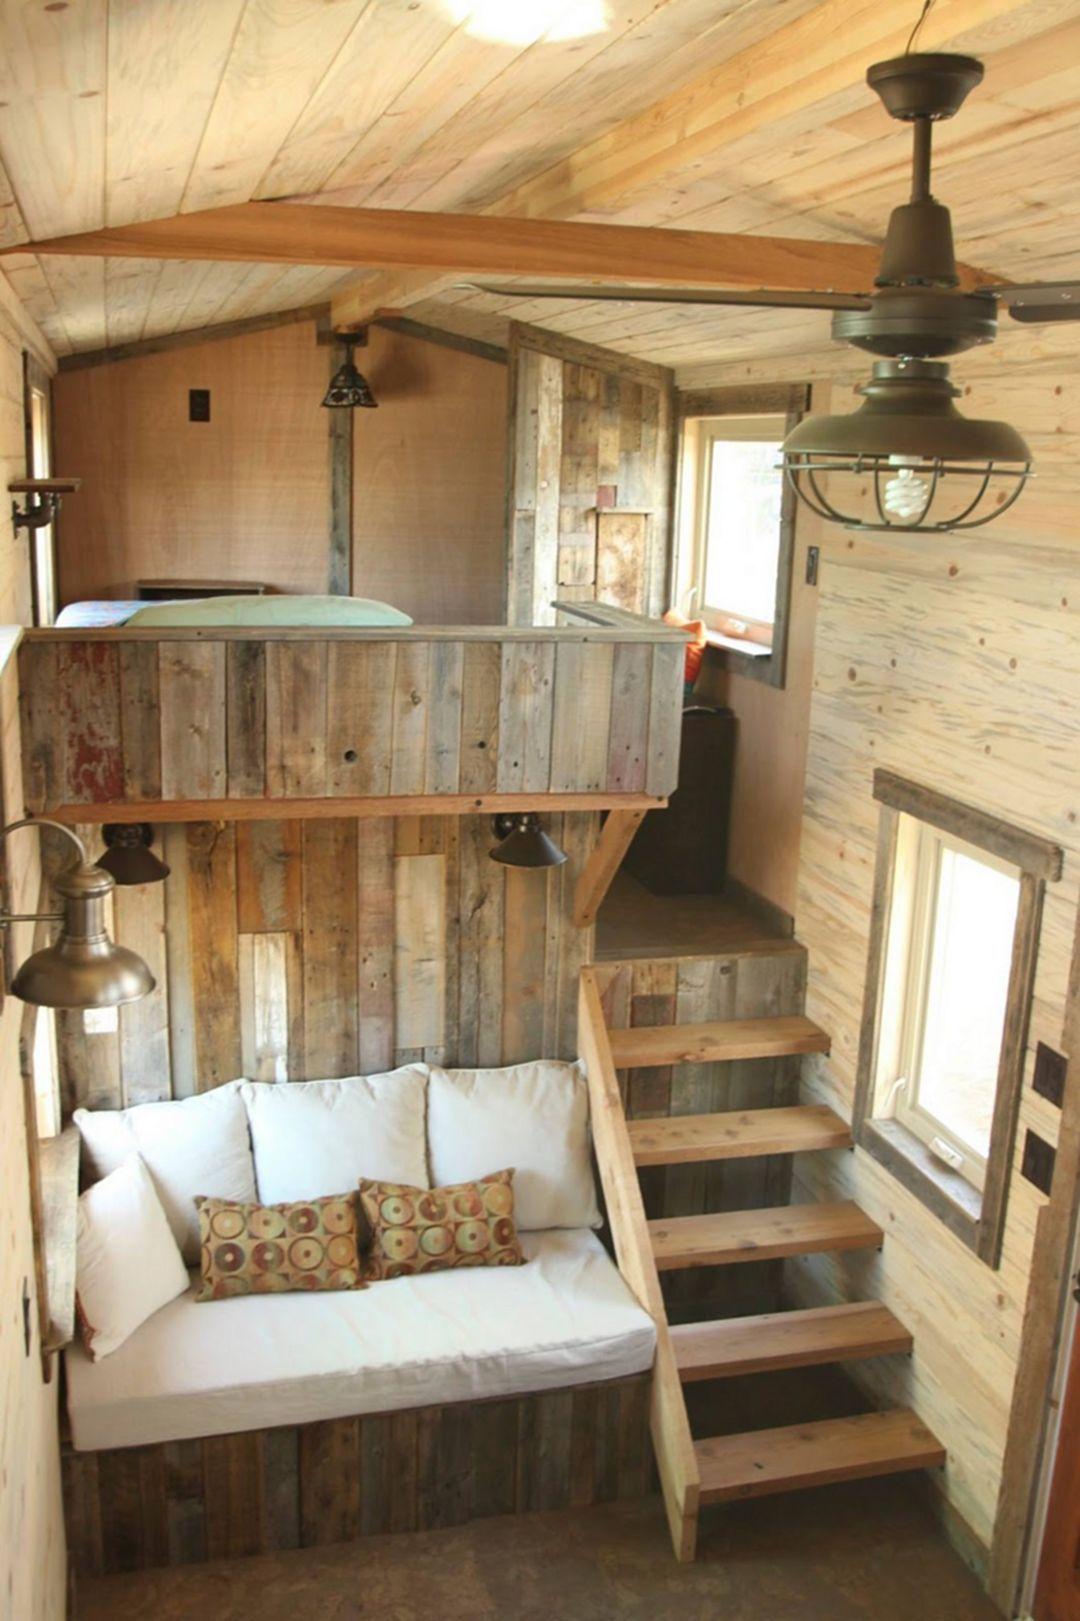 Wonderful Tiny House Design Ideas 2020 Goodsgn Tiny House Cabin Tiny House Interior Design Tiny House Design